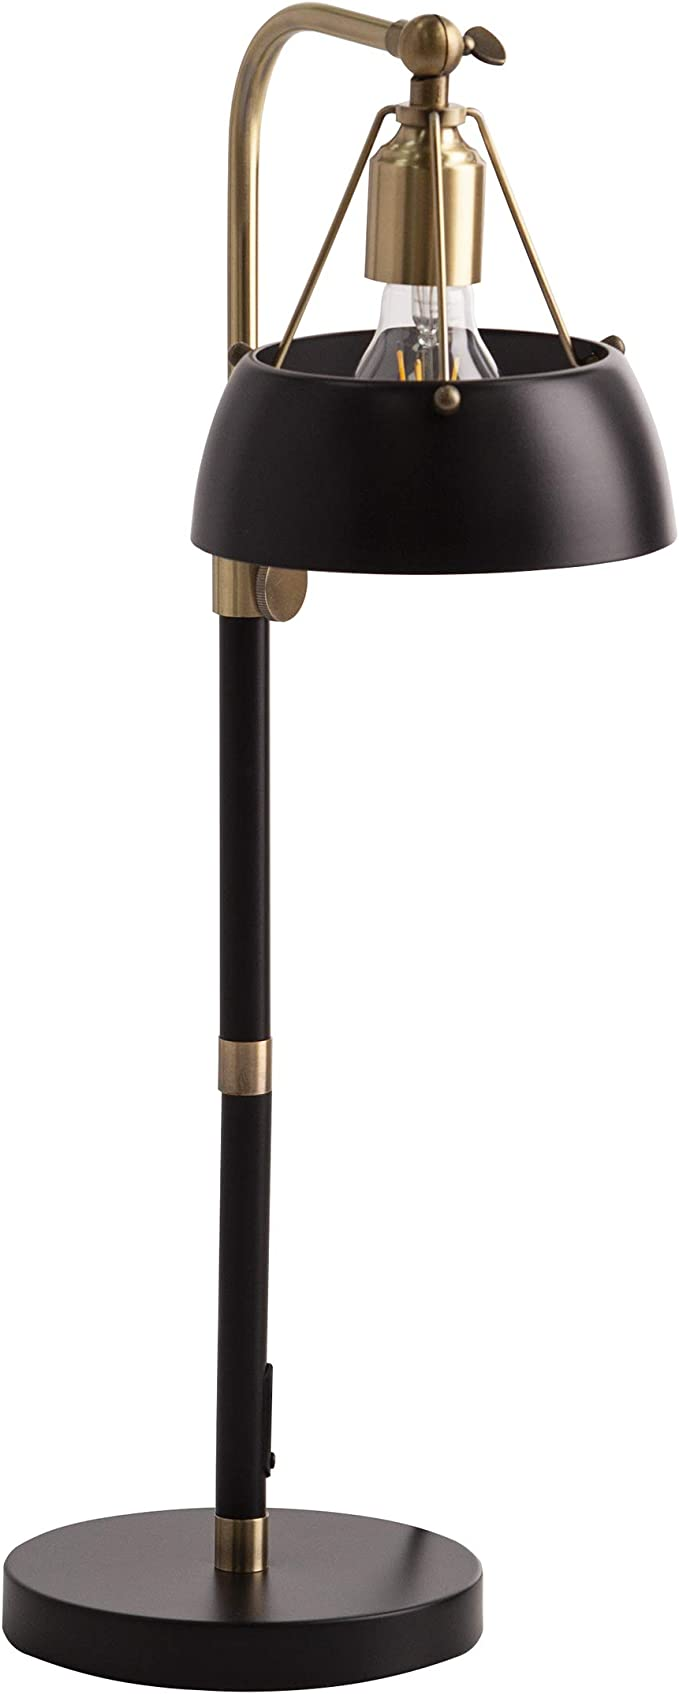 Amazon Com Sei Furniture Renmarco Table Lamp Black Antique Brass Home Improvement